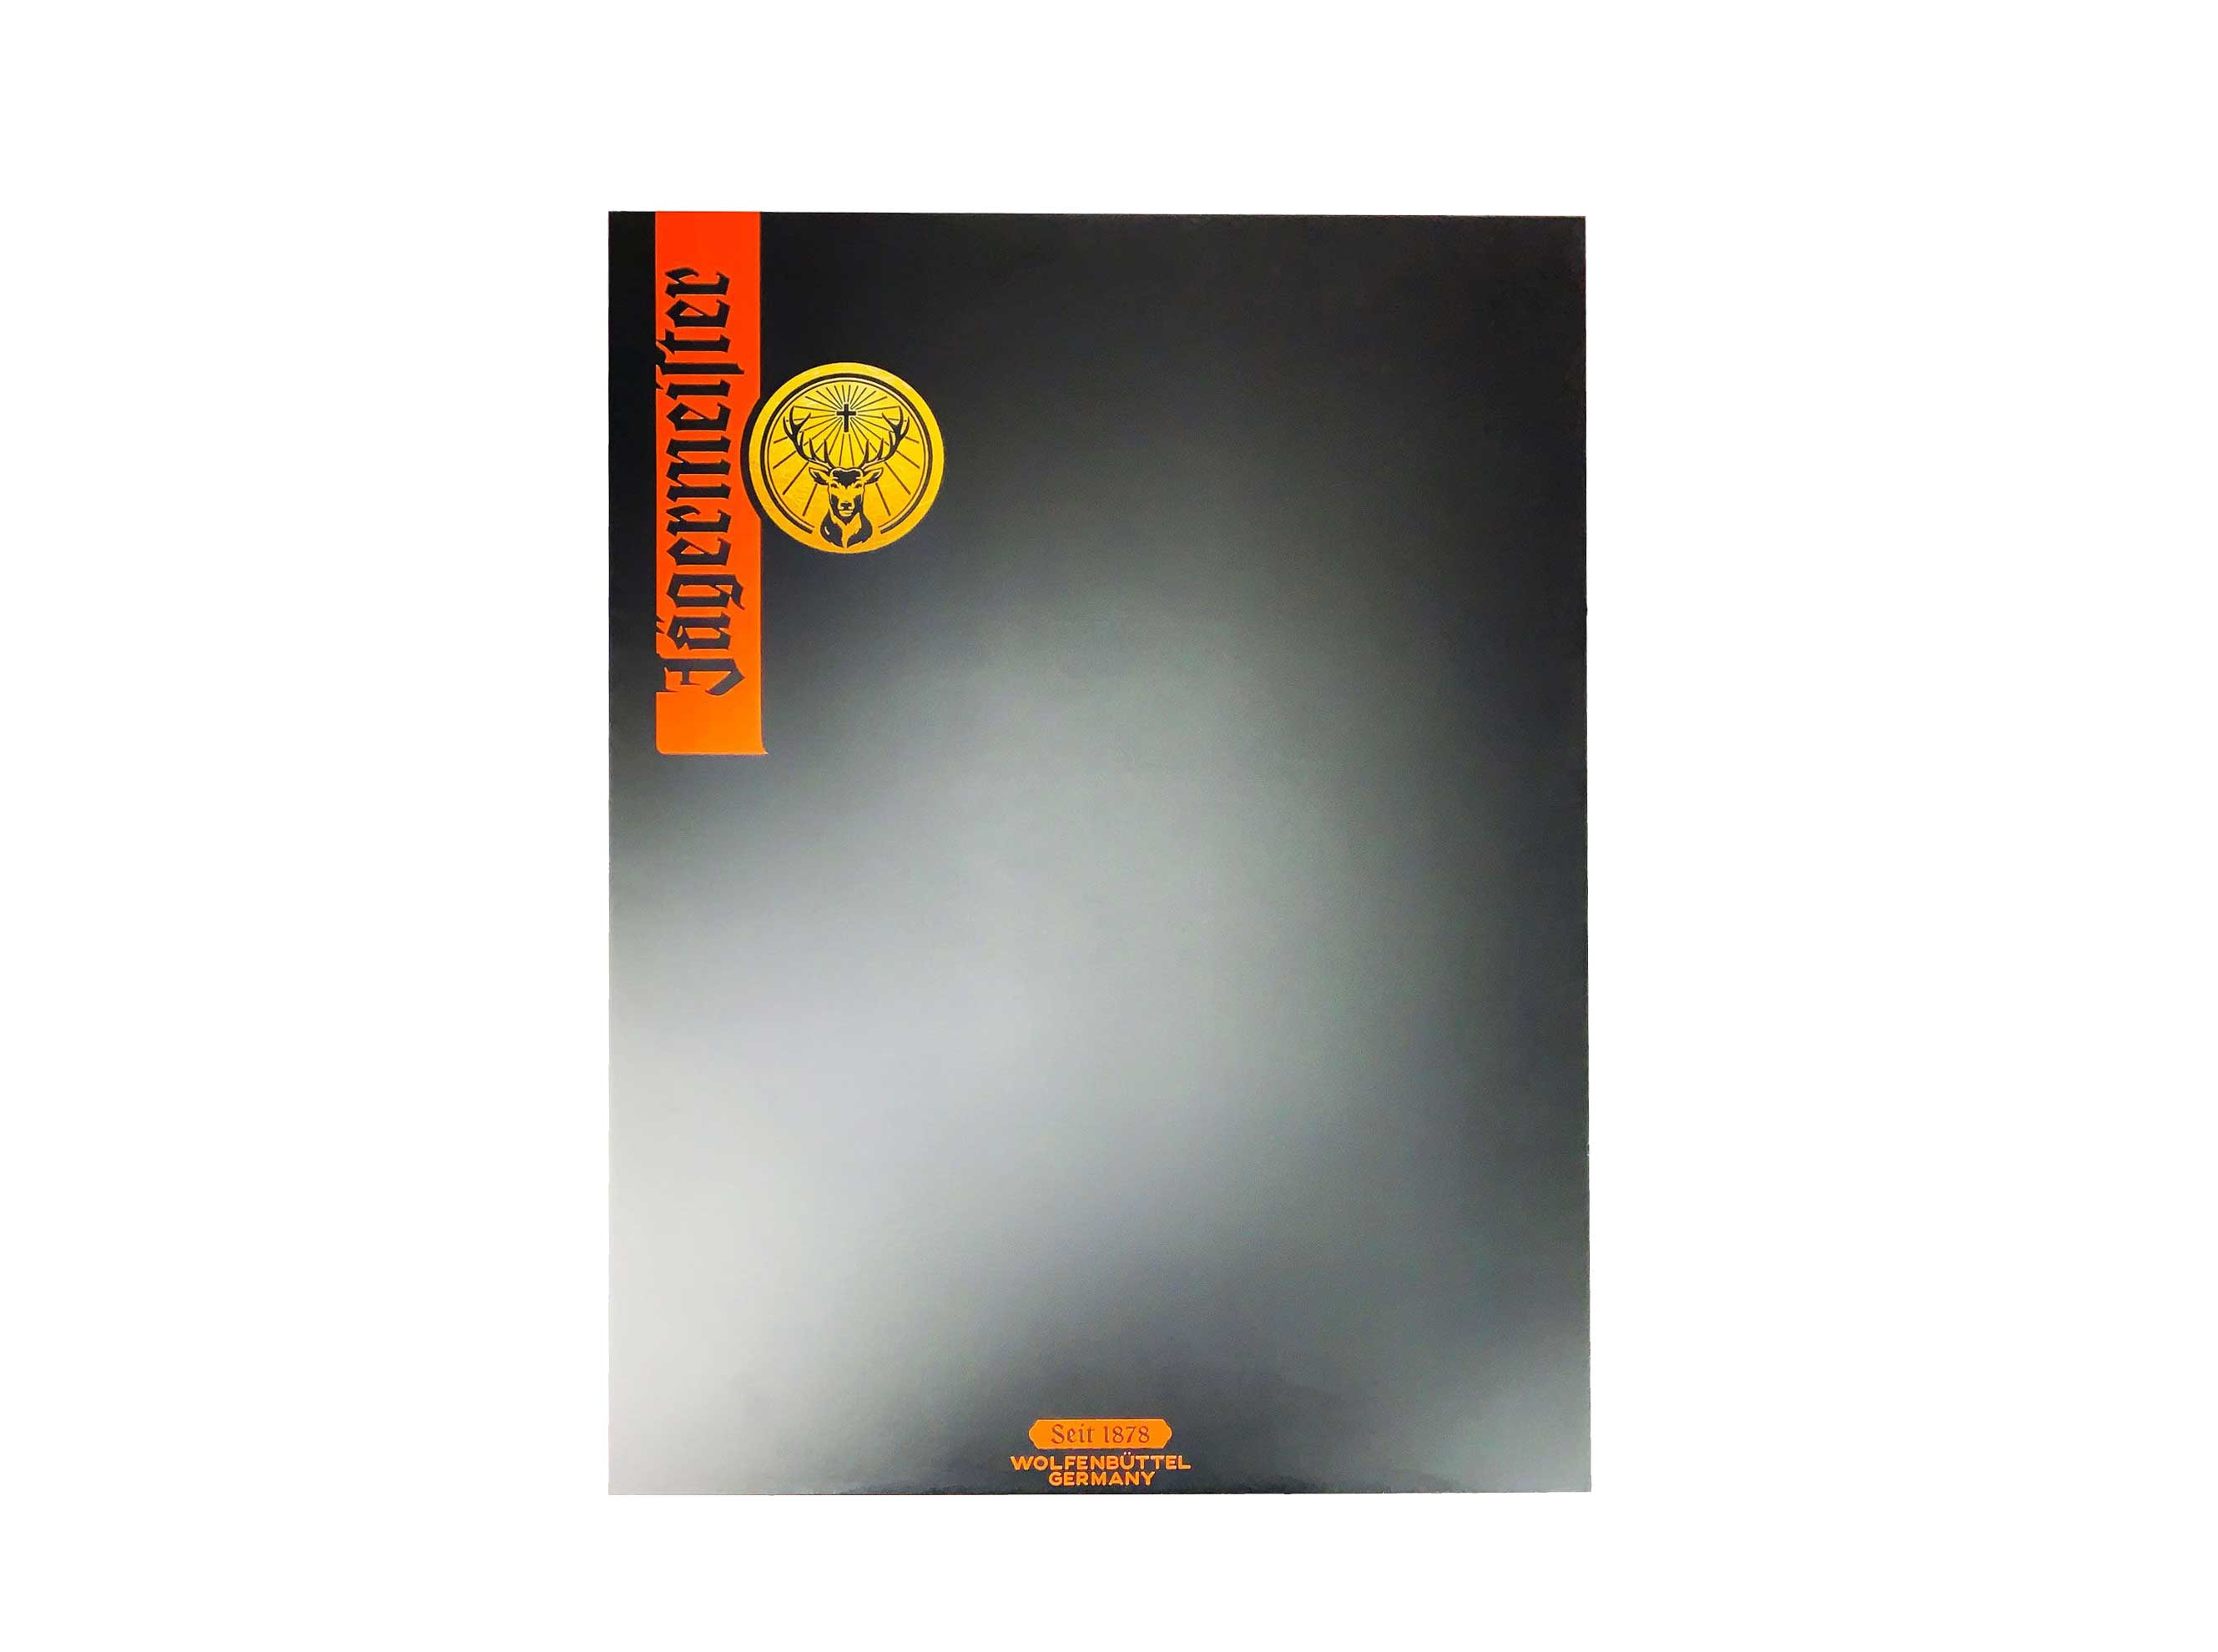 Jägermeister Kreidetafel Tafel Reklametafel ca. 60x80cm